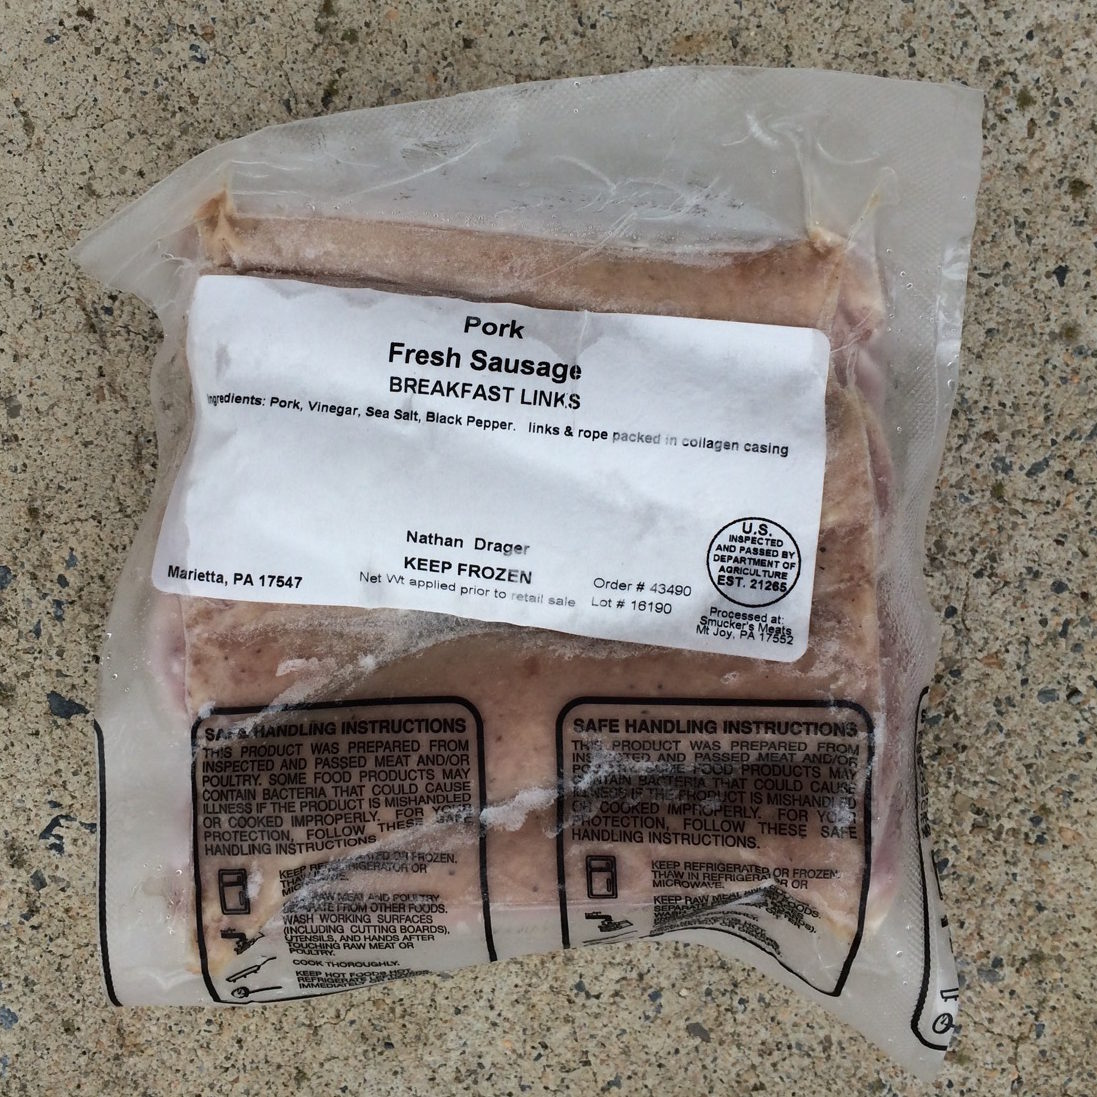 Pork Sausage Breakfast Links | Drager Farms, Marietta PA